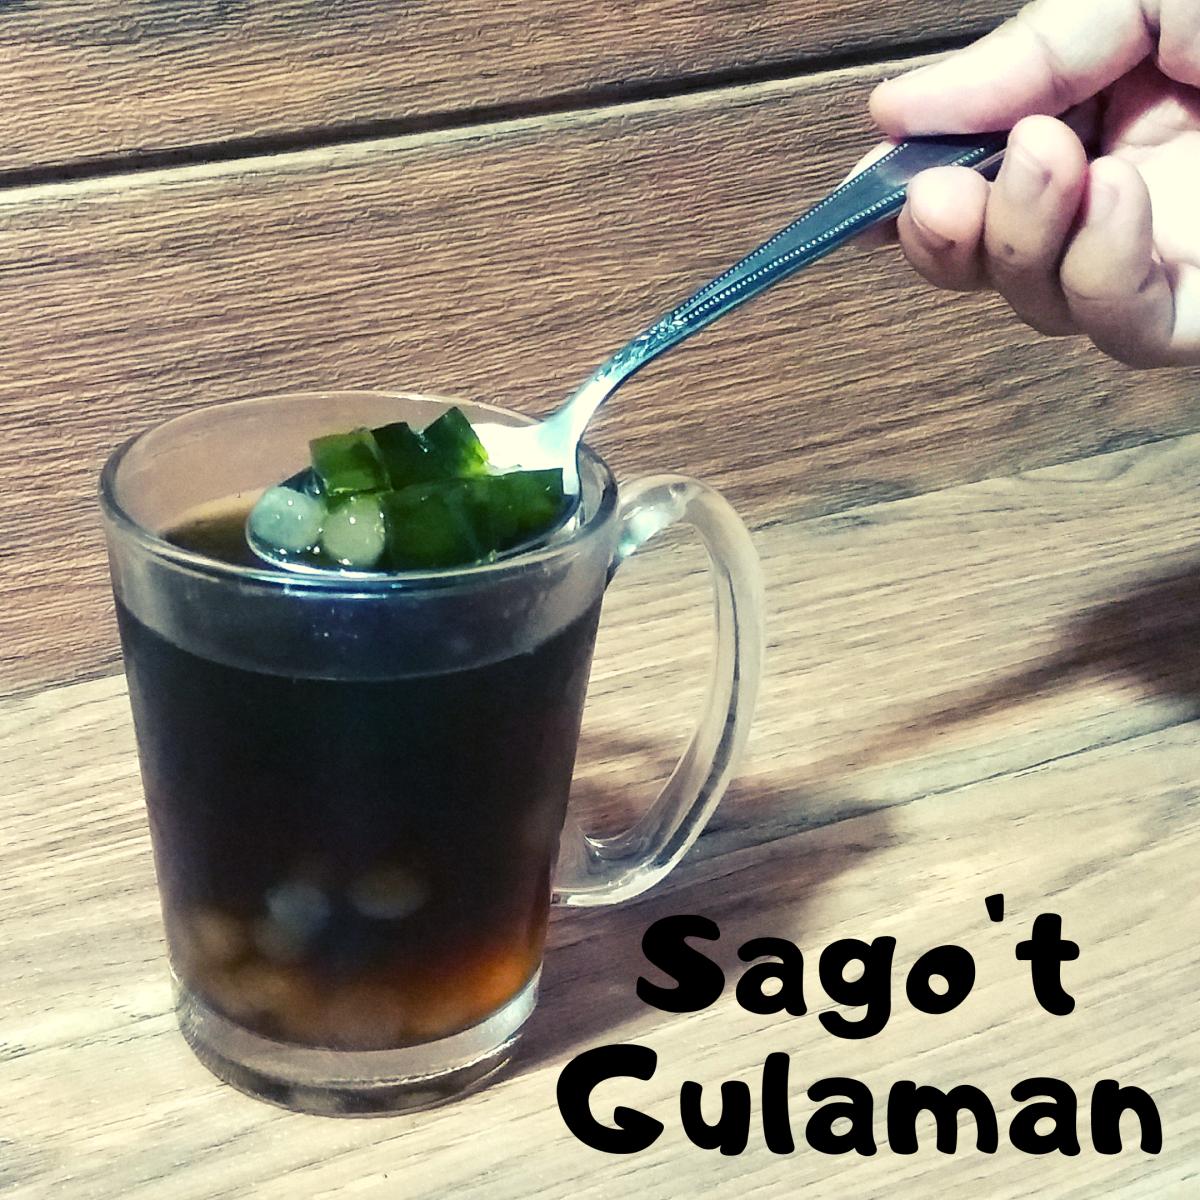 How to Make Sago't Gulaman: A Filipino-Inspired Drink